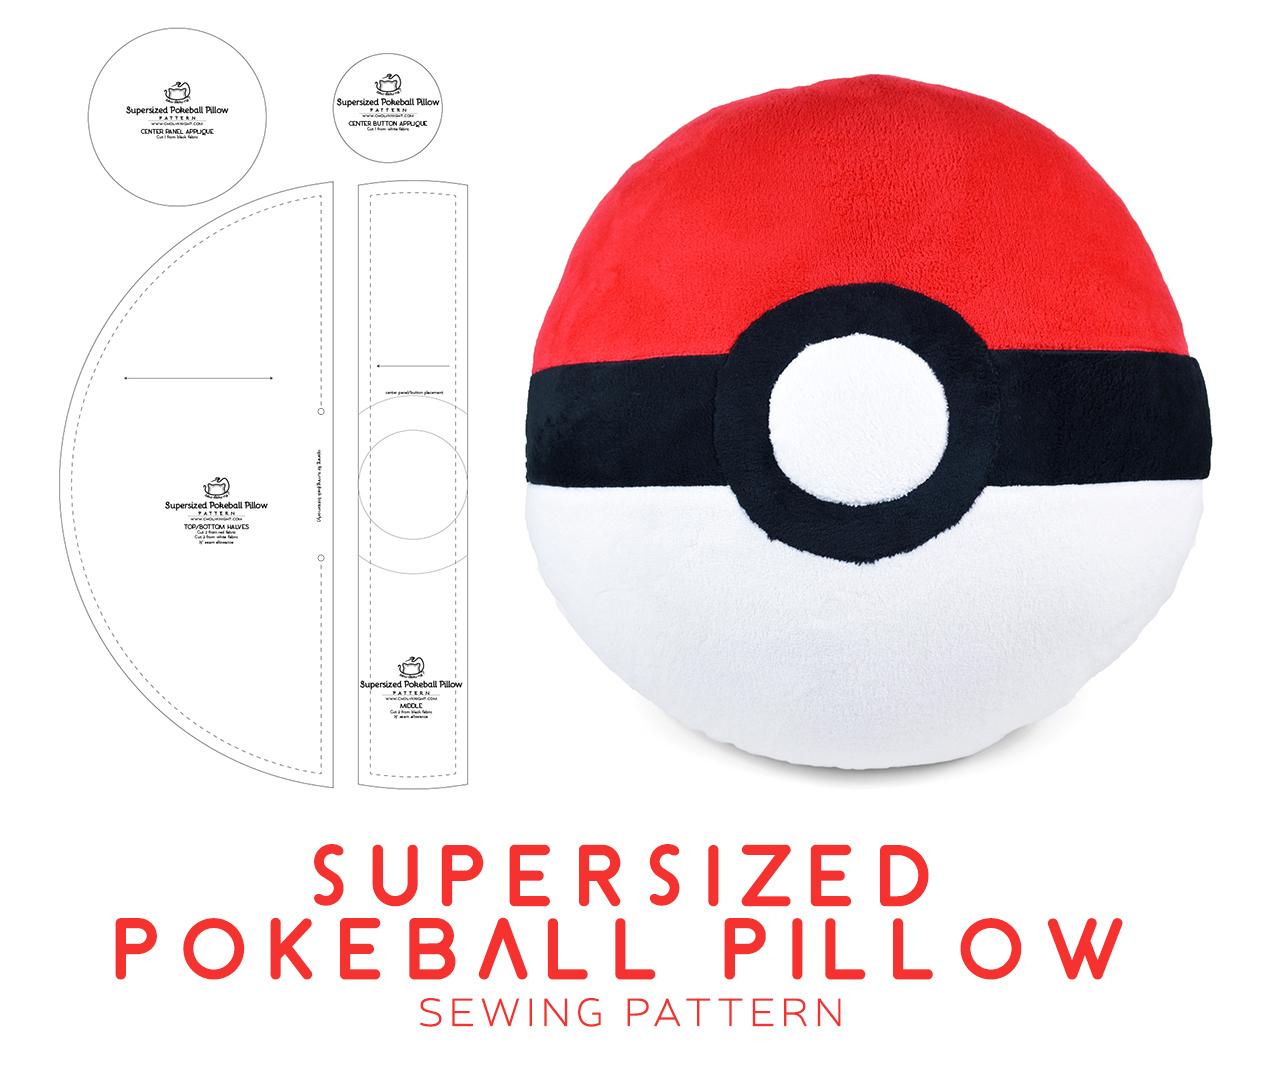 Supersized Pokeball Pillow Sewing Pattern by SewDesuNe